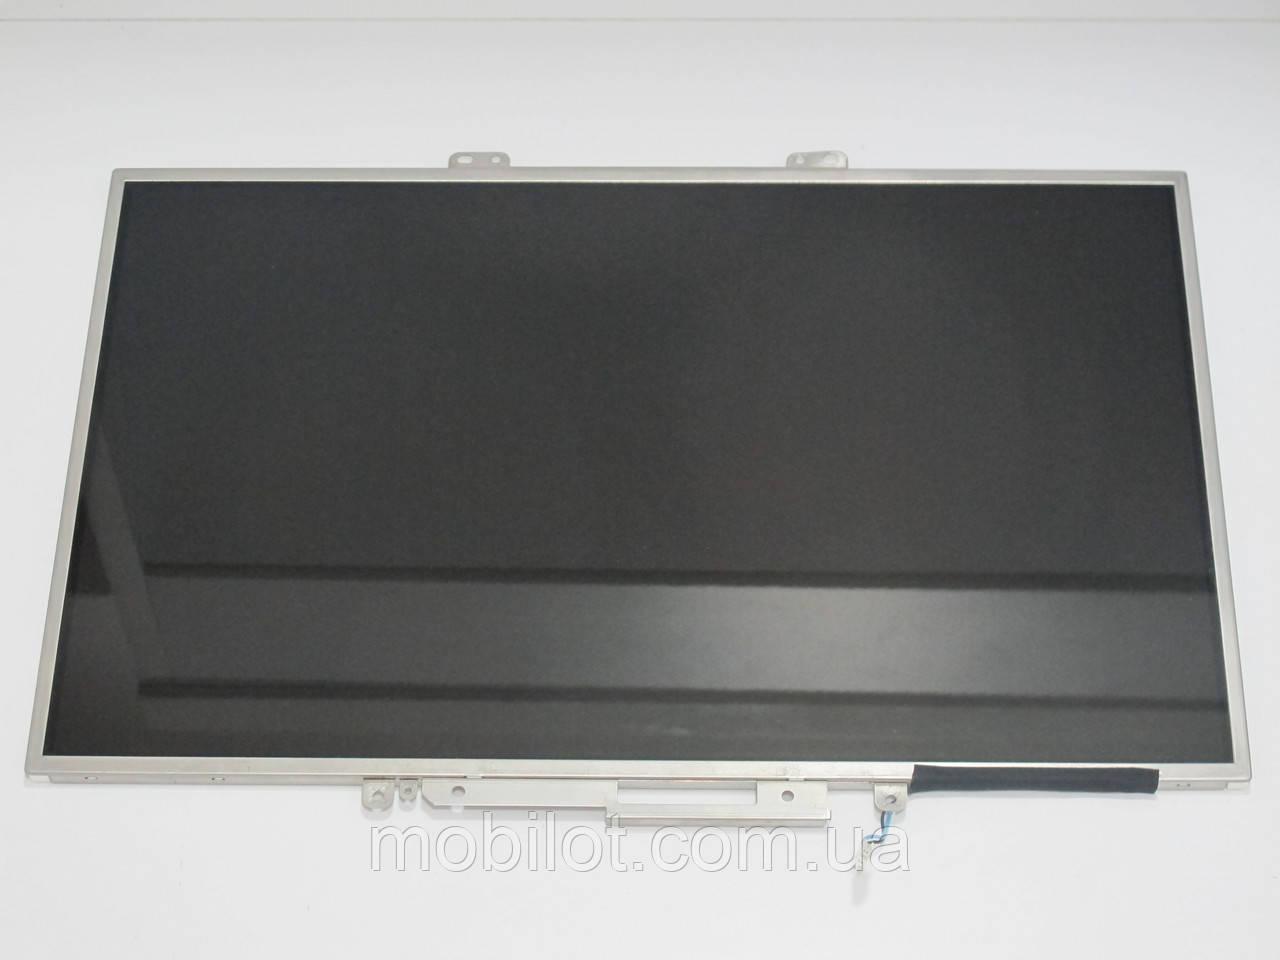 Экран (матрица) 17.0 Lamp Dell 1720 (NZ-5852)